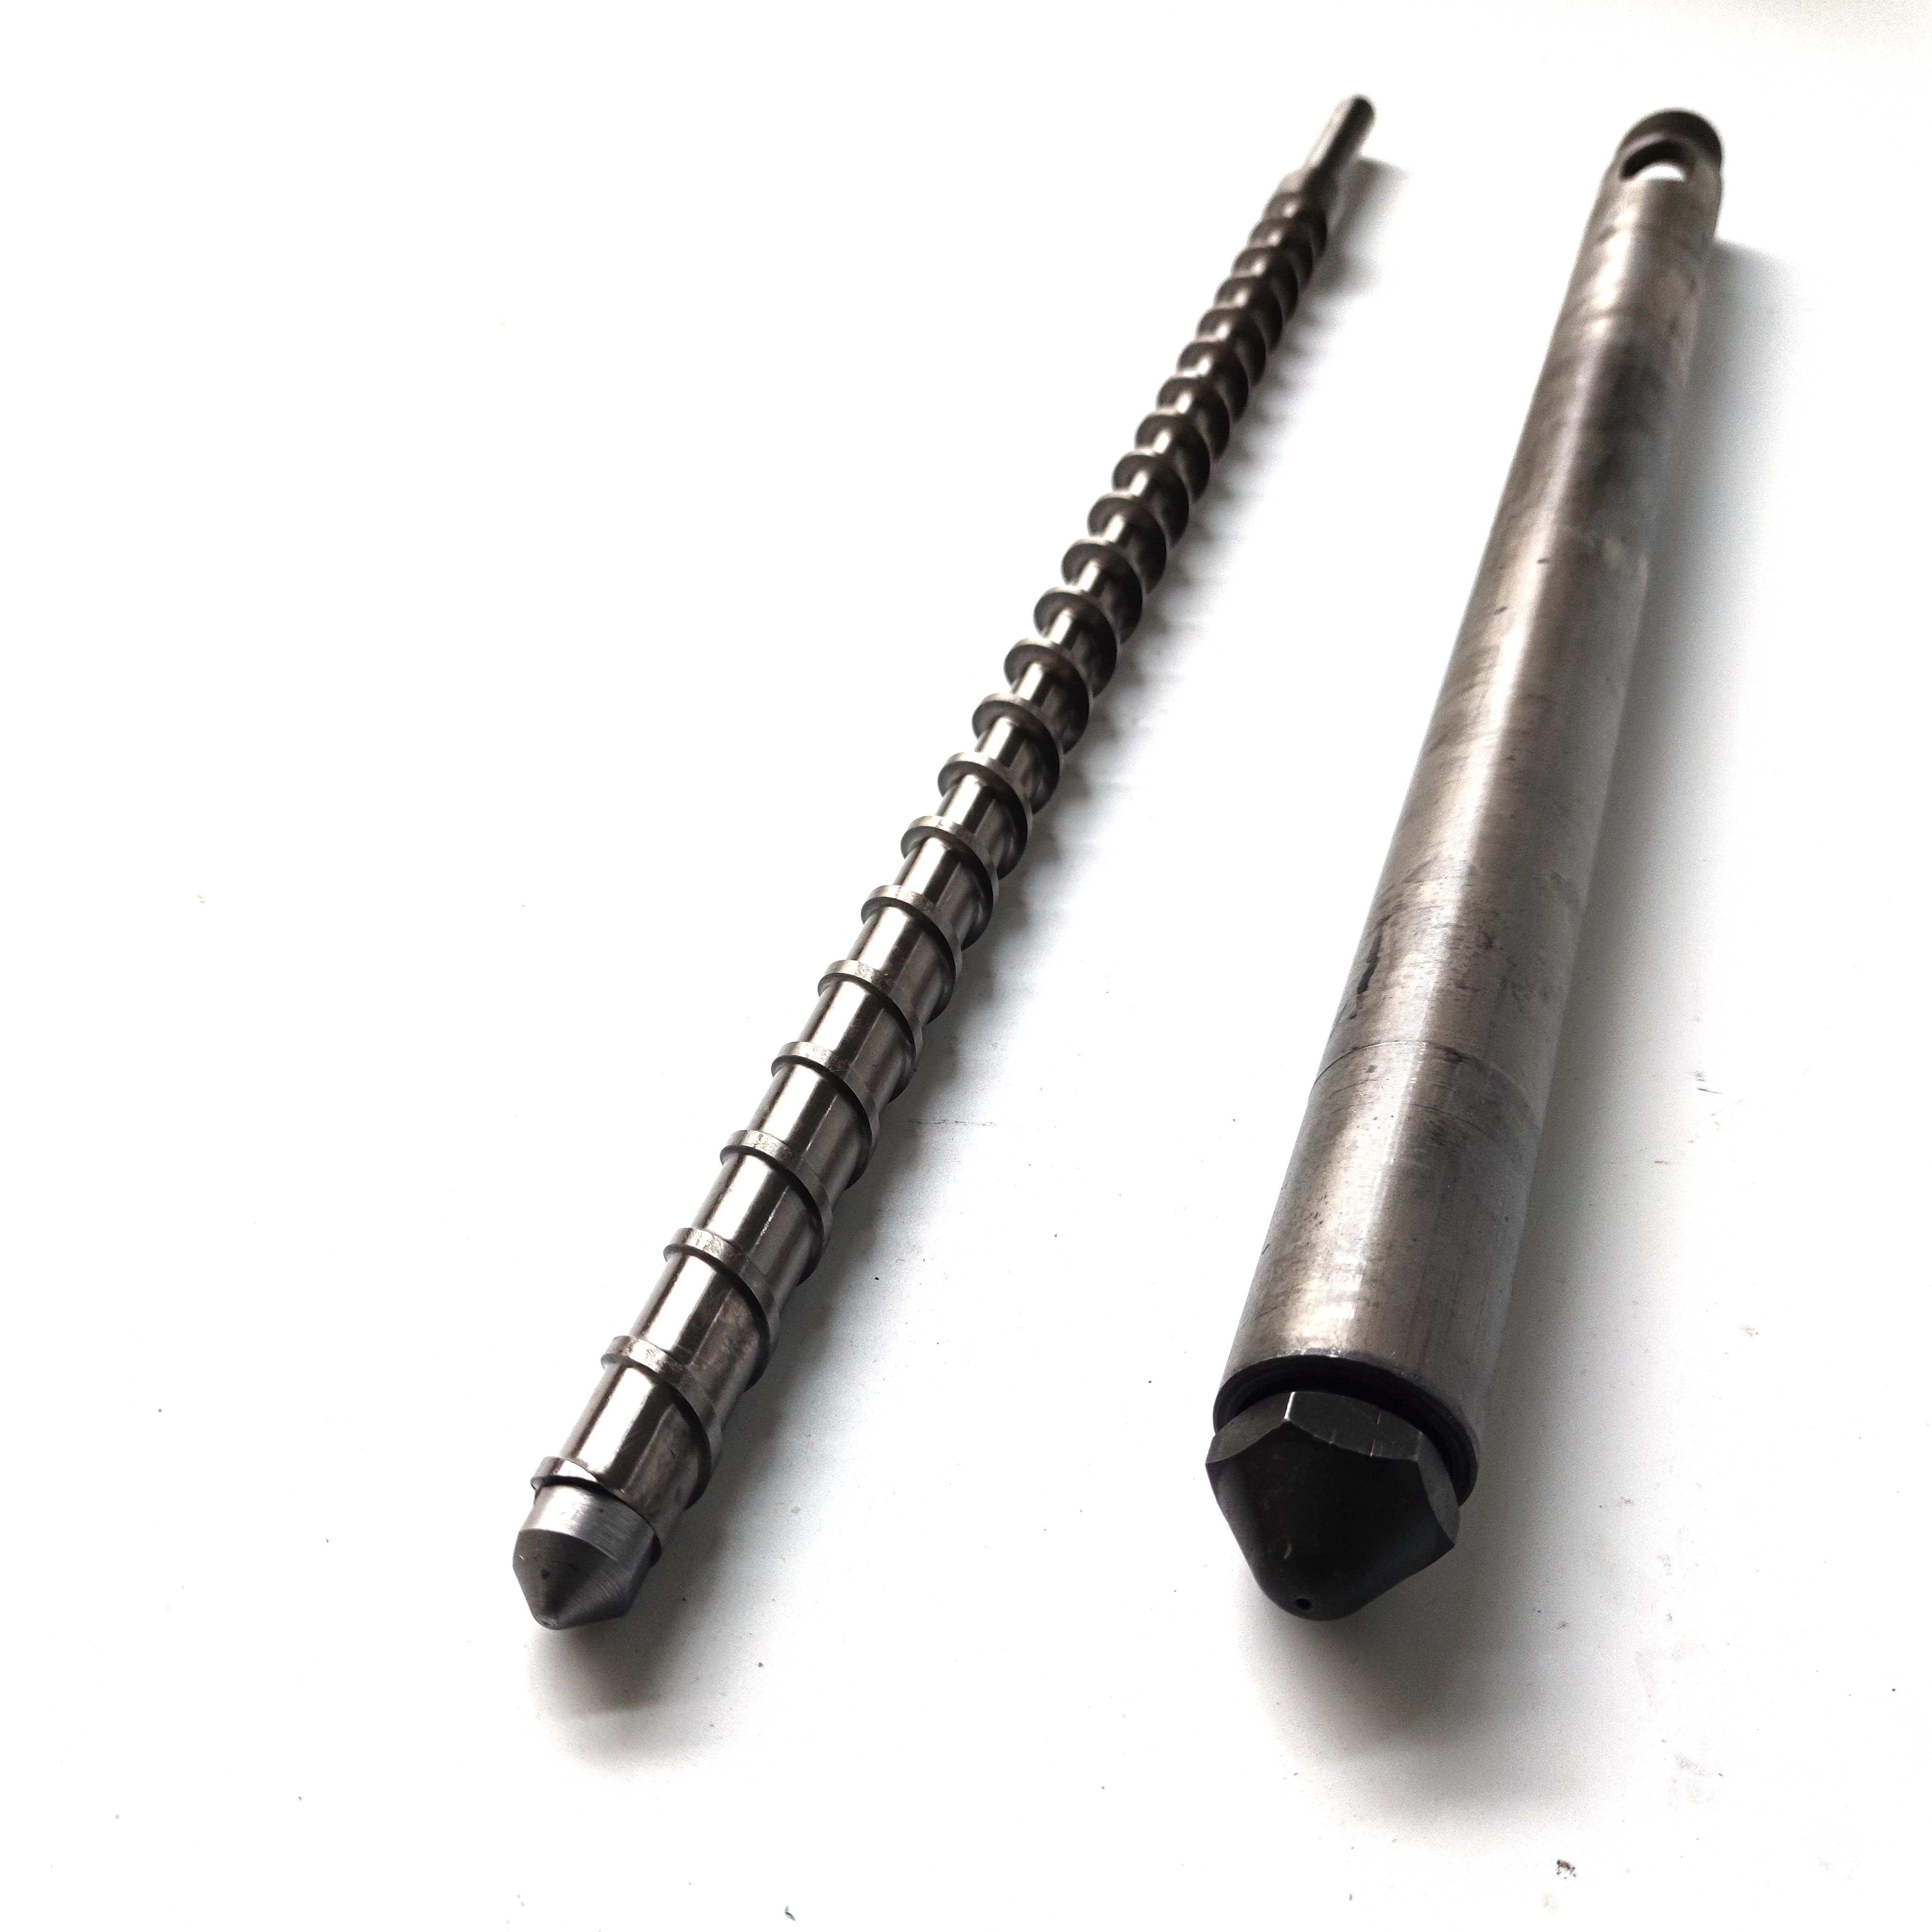 For Plastic 38CrMoAlA Project Diameter Material Precious 30mm Extrusion Screw